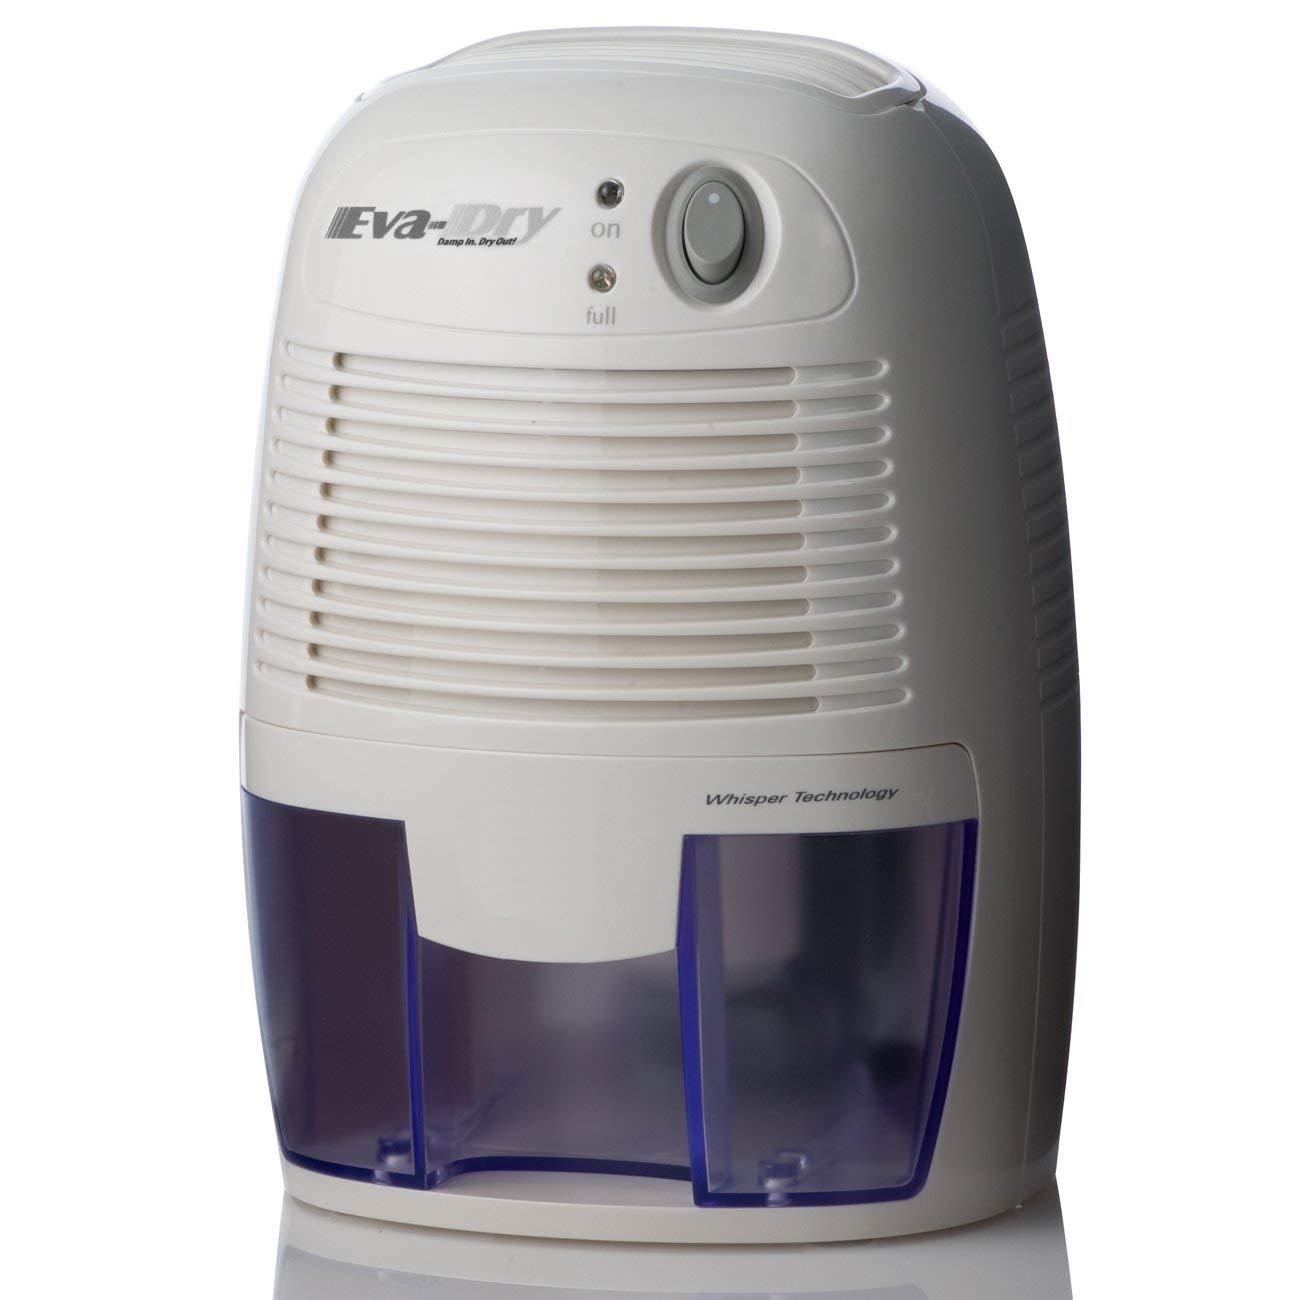 Eva-dry Edv-1100 Electric Petite Dehumidifier, White.jpg